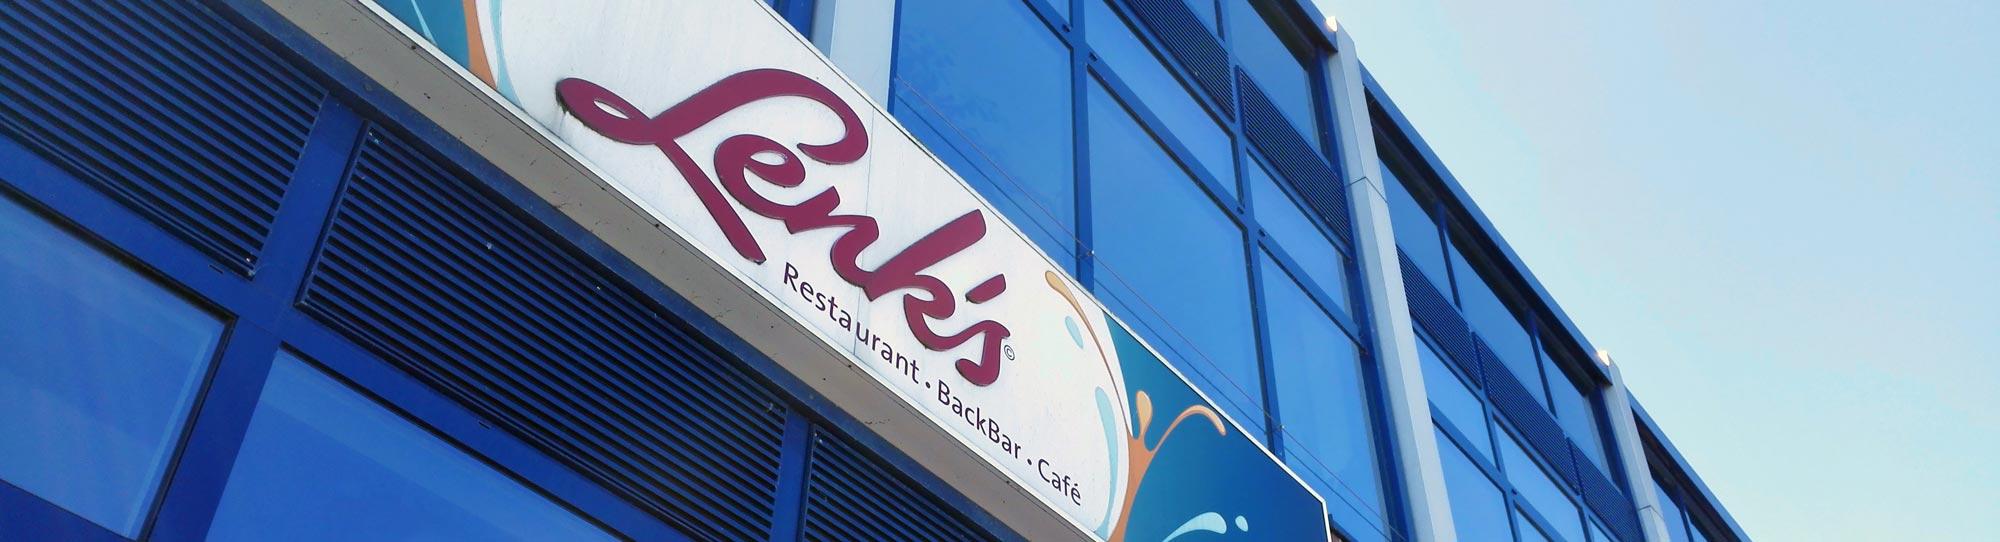 Essen mit Ausblick – das Lenk's in Rostock